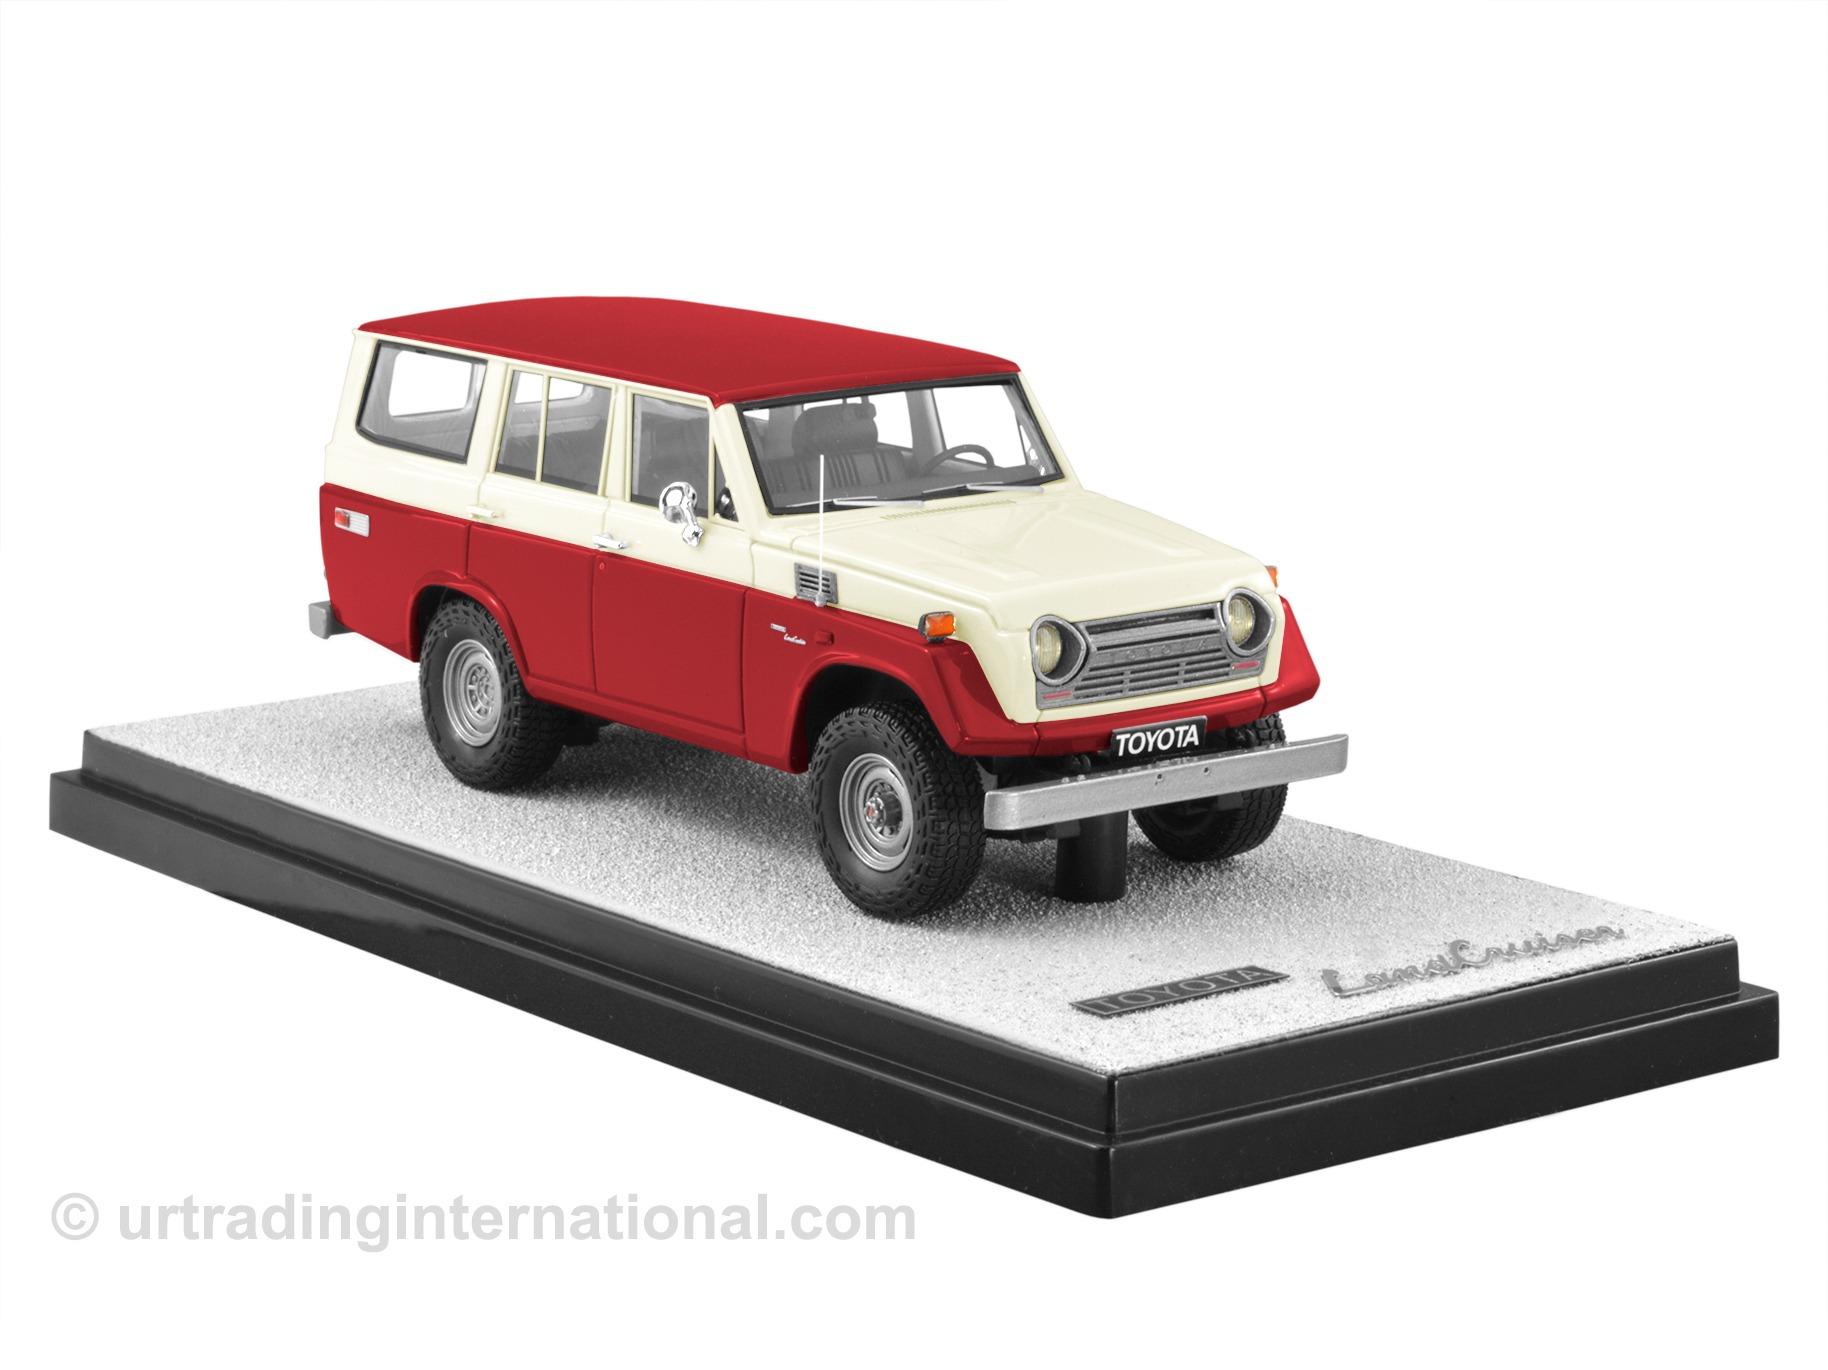 1974 Toyota Land Cruiser FJ55 – Red/Cream LHD